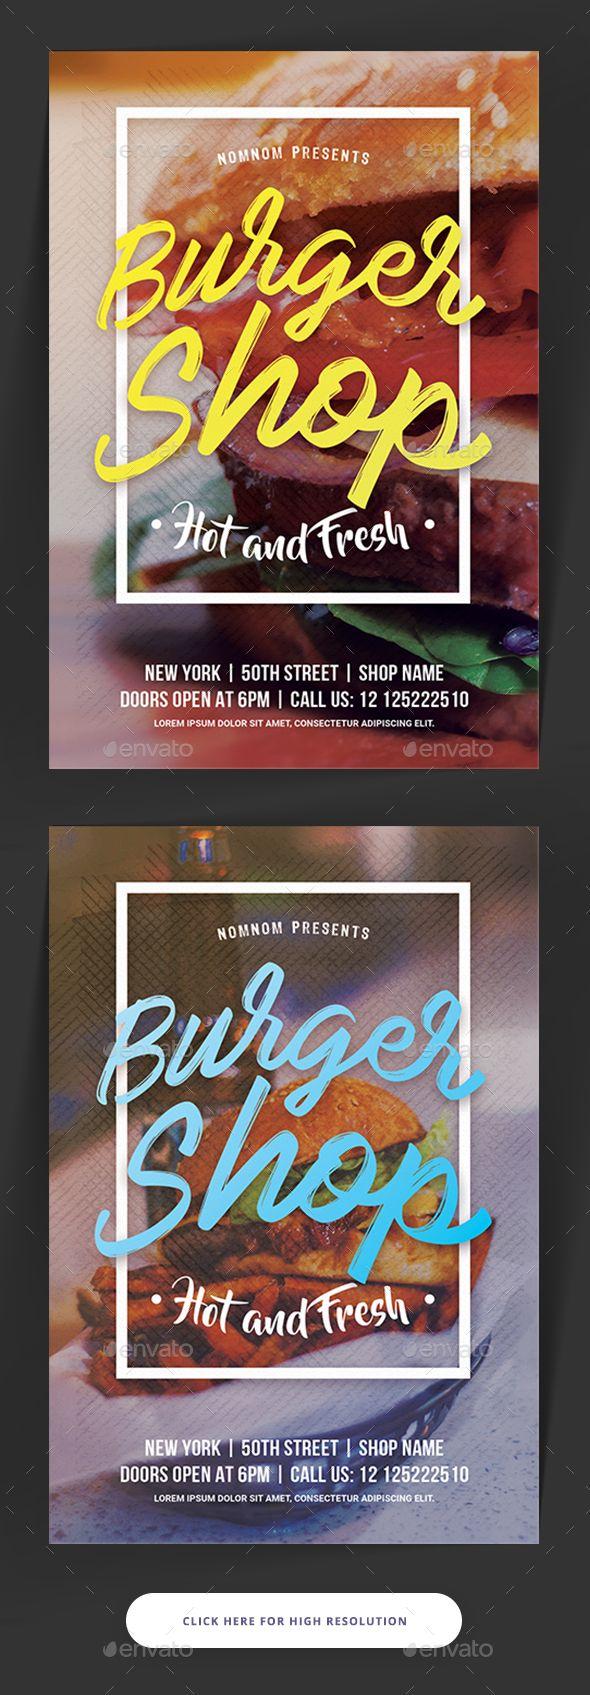 Burger Shop Flyer  — PSD Template #food #dinner • Download ➝ https://graphicriver.net/item/burger-shop-flyer/18175630?ref=pxcr